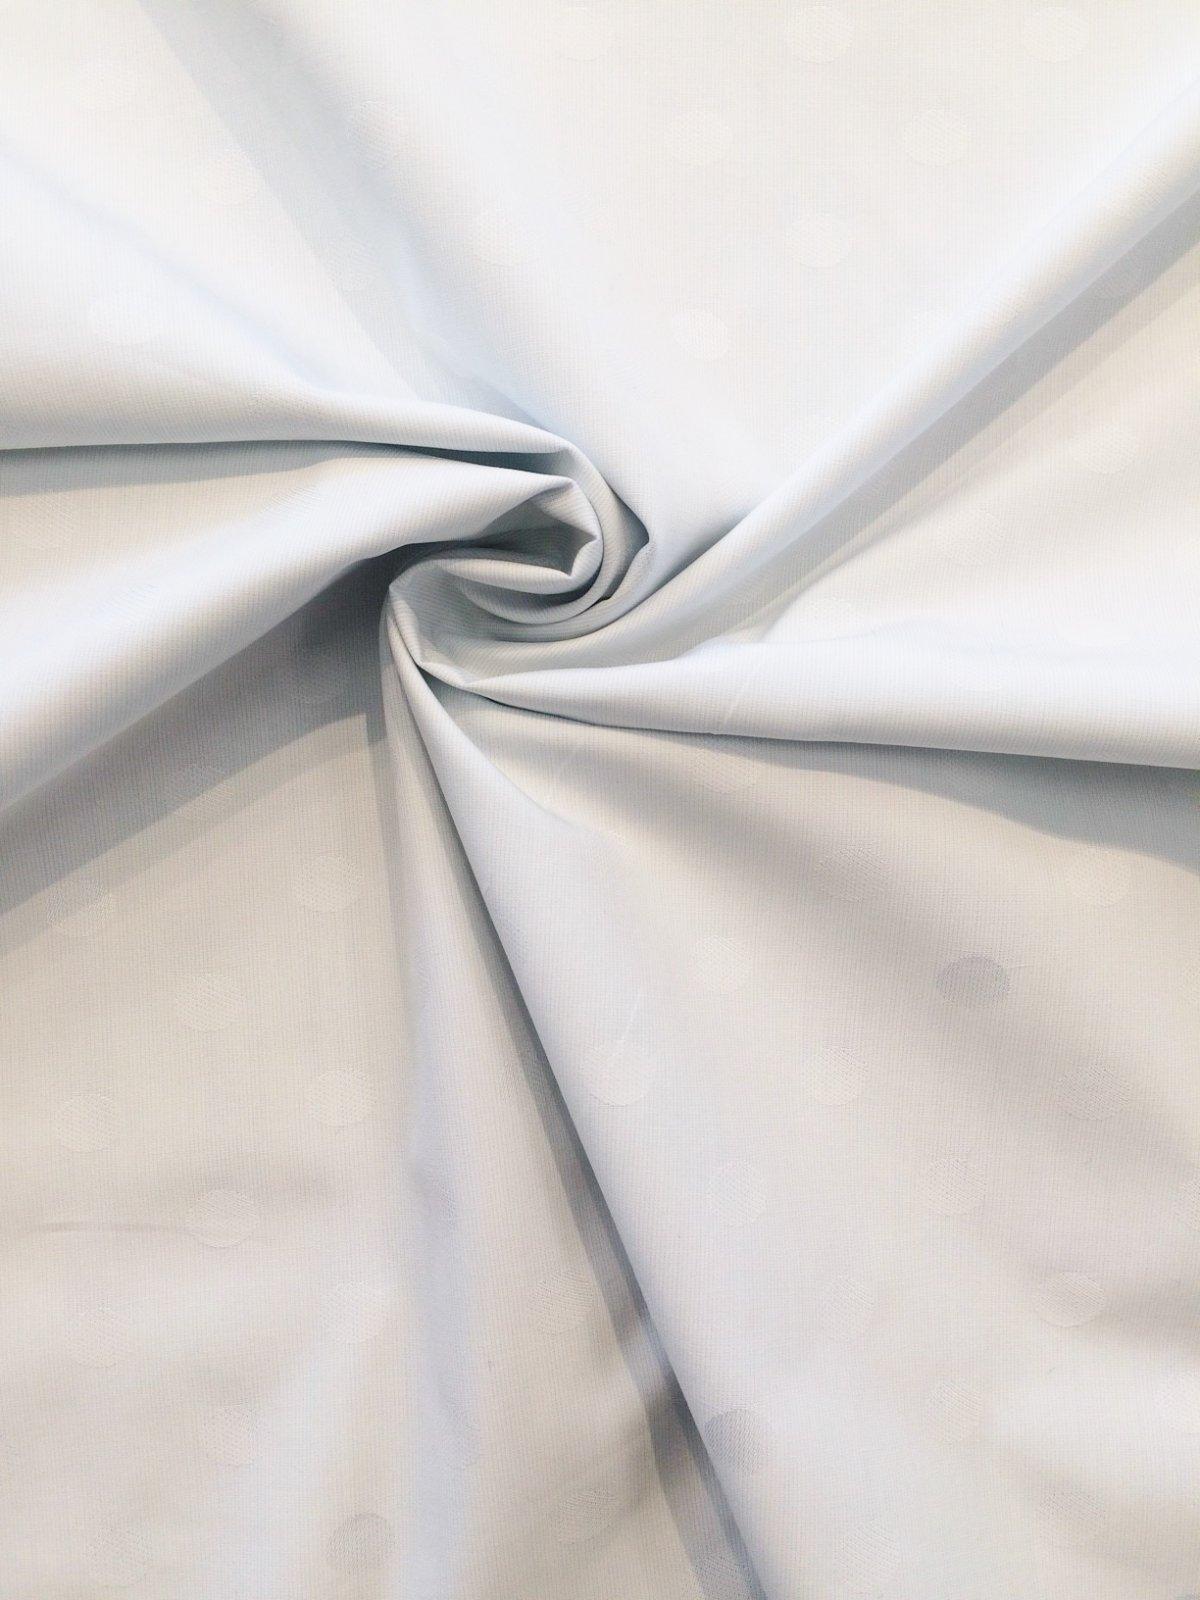 Pale Blue Jacquard Polka Dot Shirting